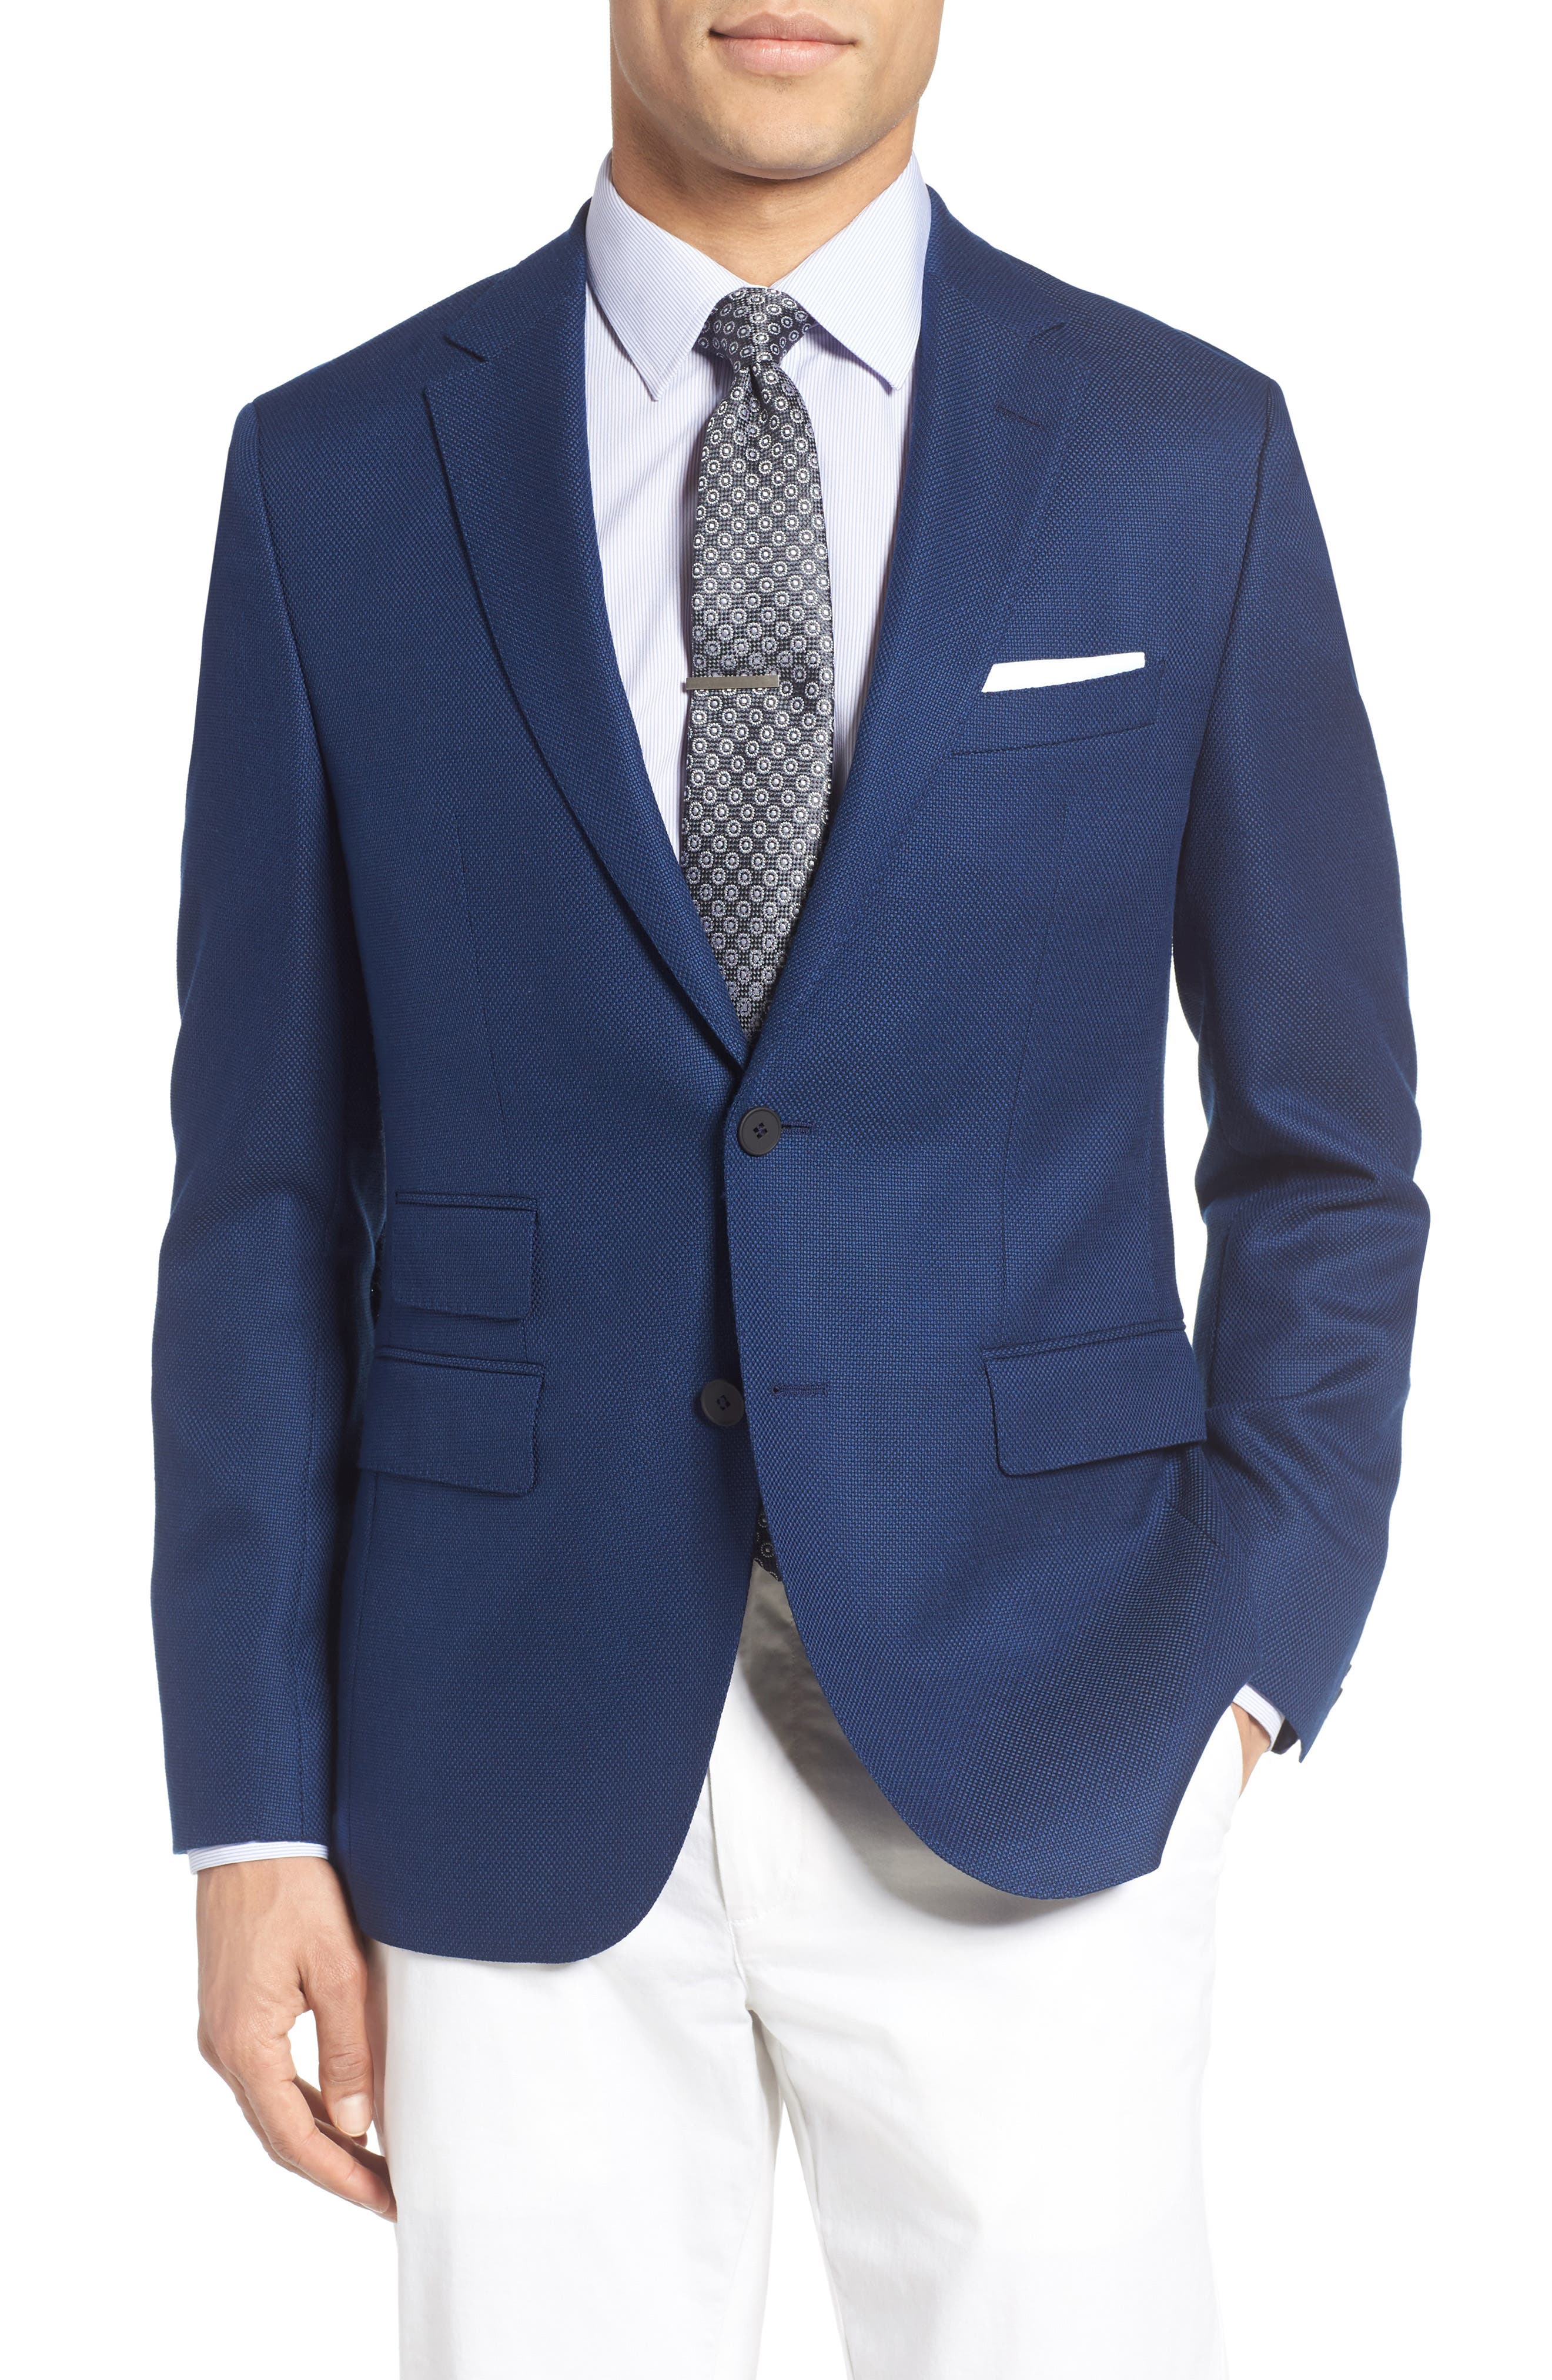 ZZDNUHUGO BOSS BOSS Jet Trim Fit Stretch Wool Travel Blazer, Main, color, 420